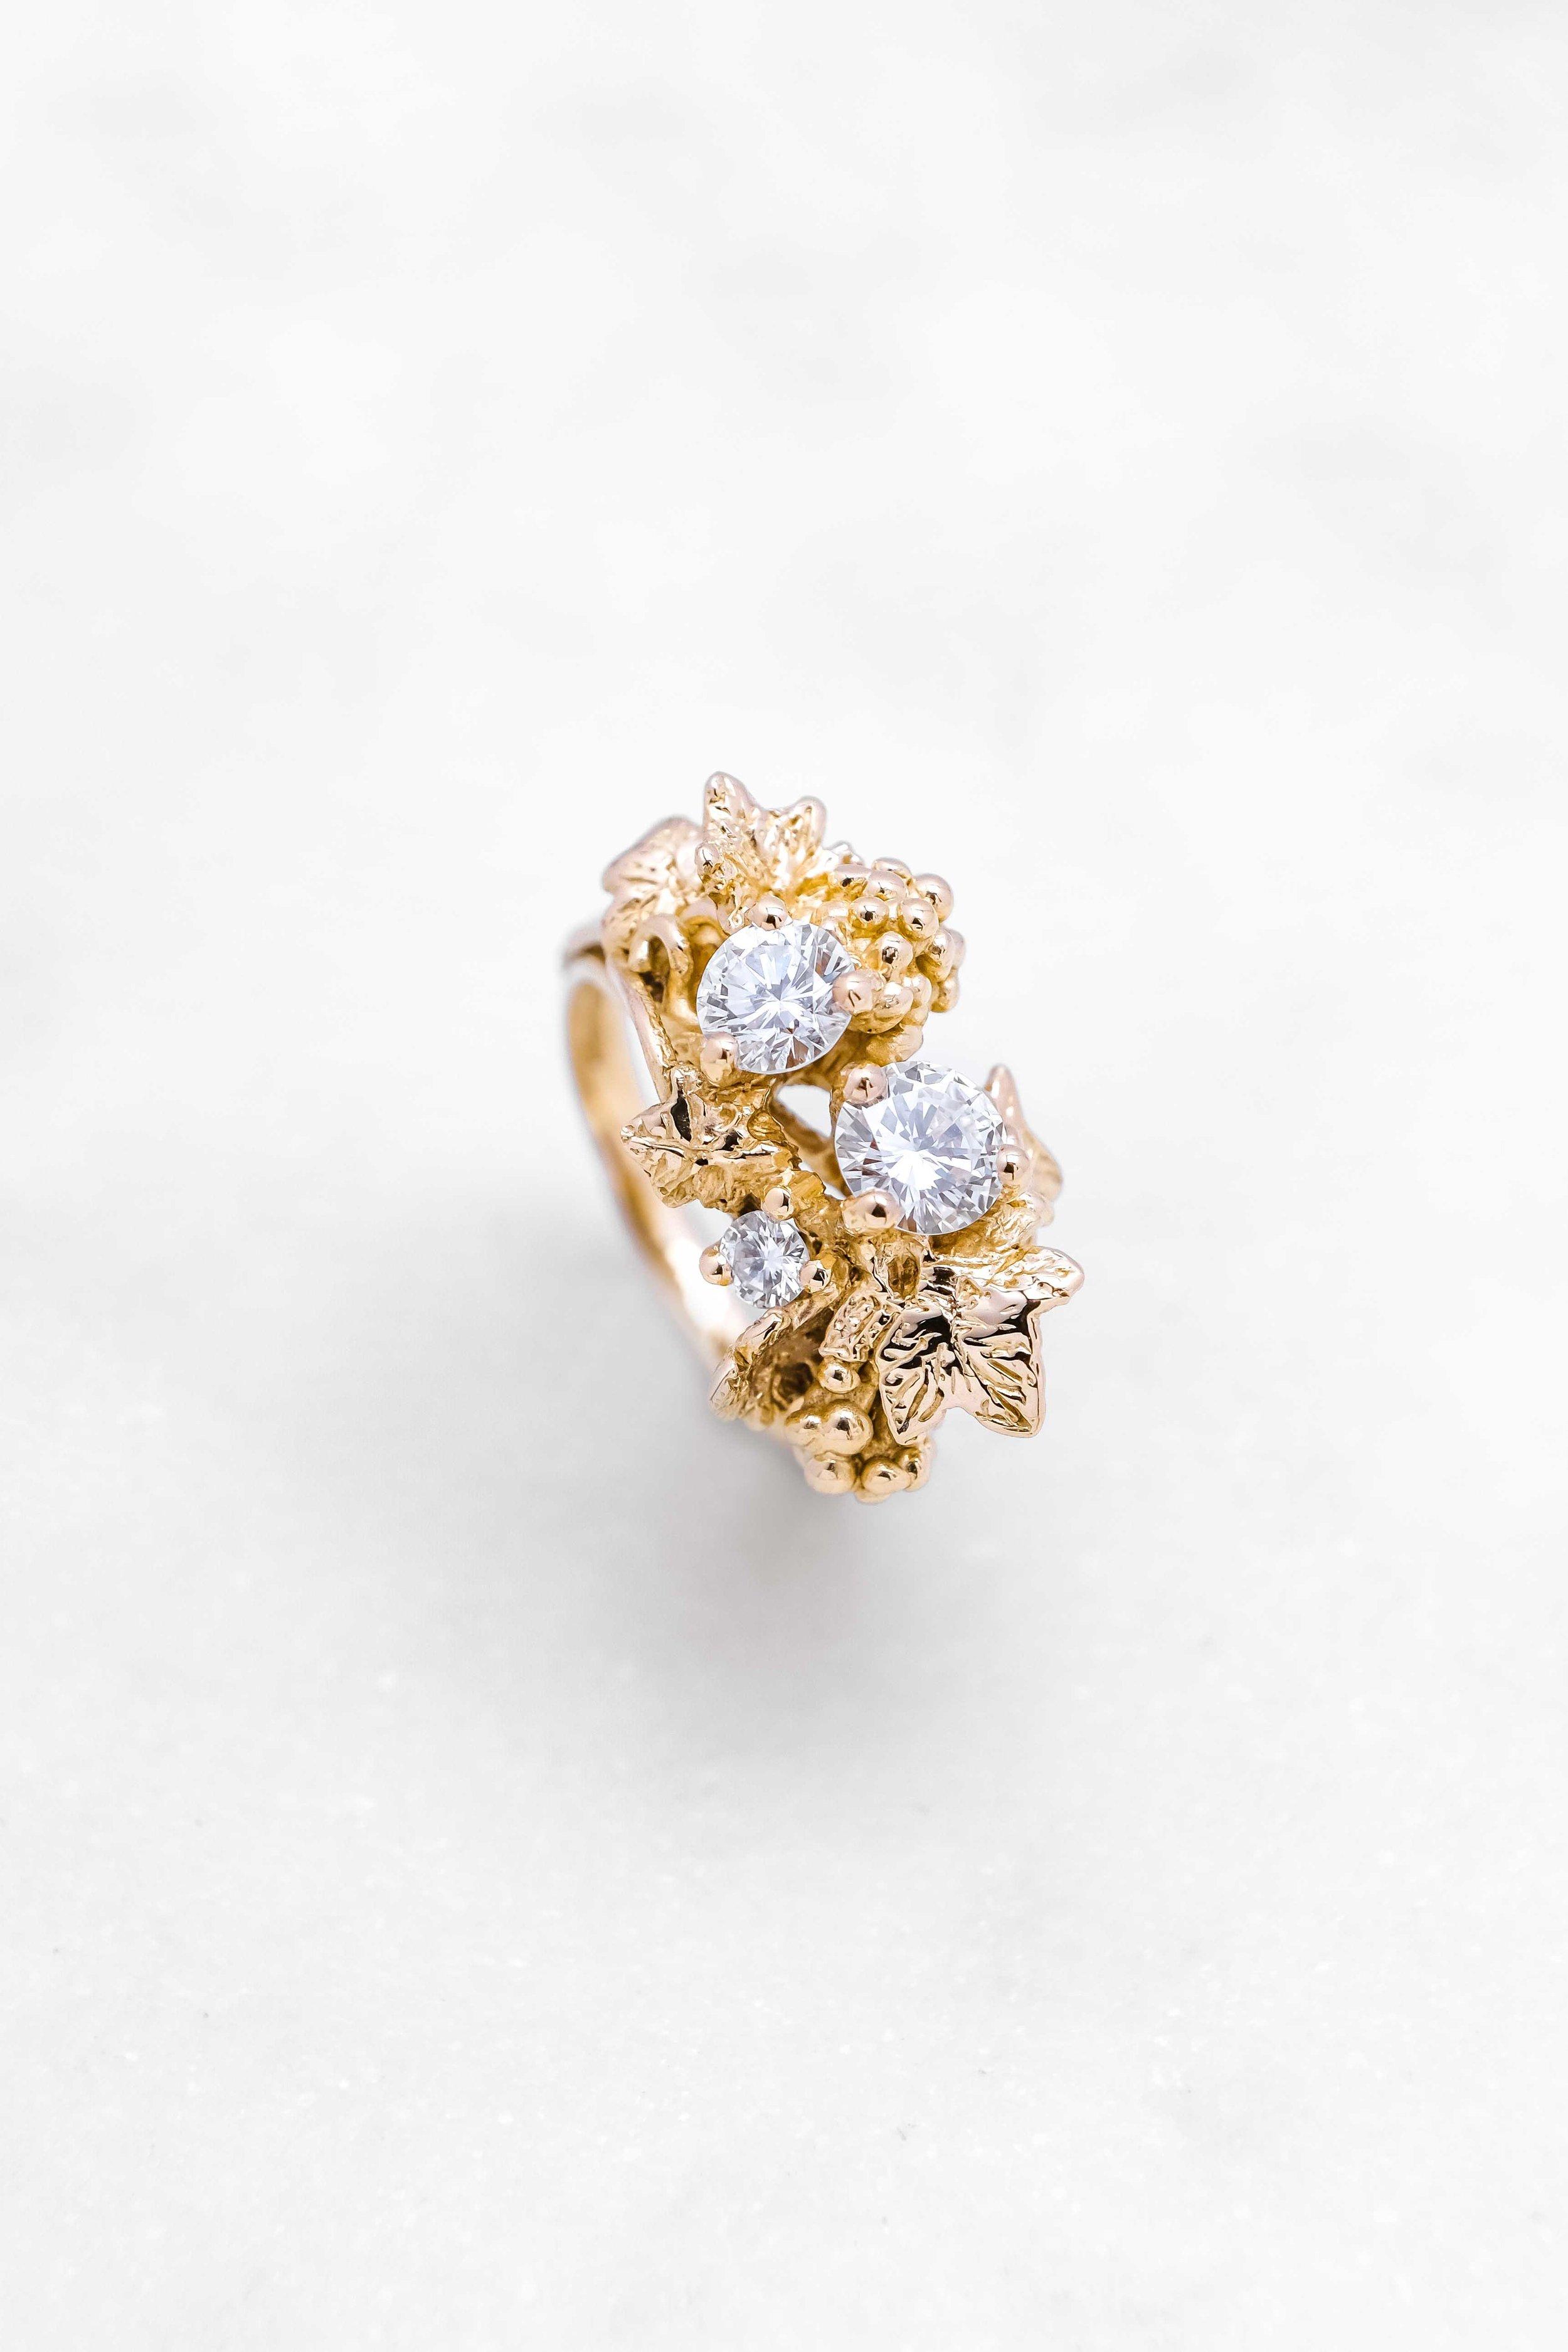 black-alchemy-ring-gold-diamonds-vitis-3-3.jpg